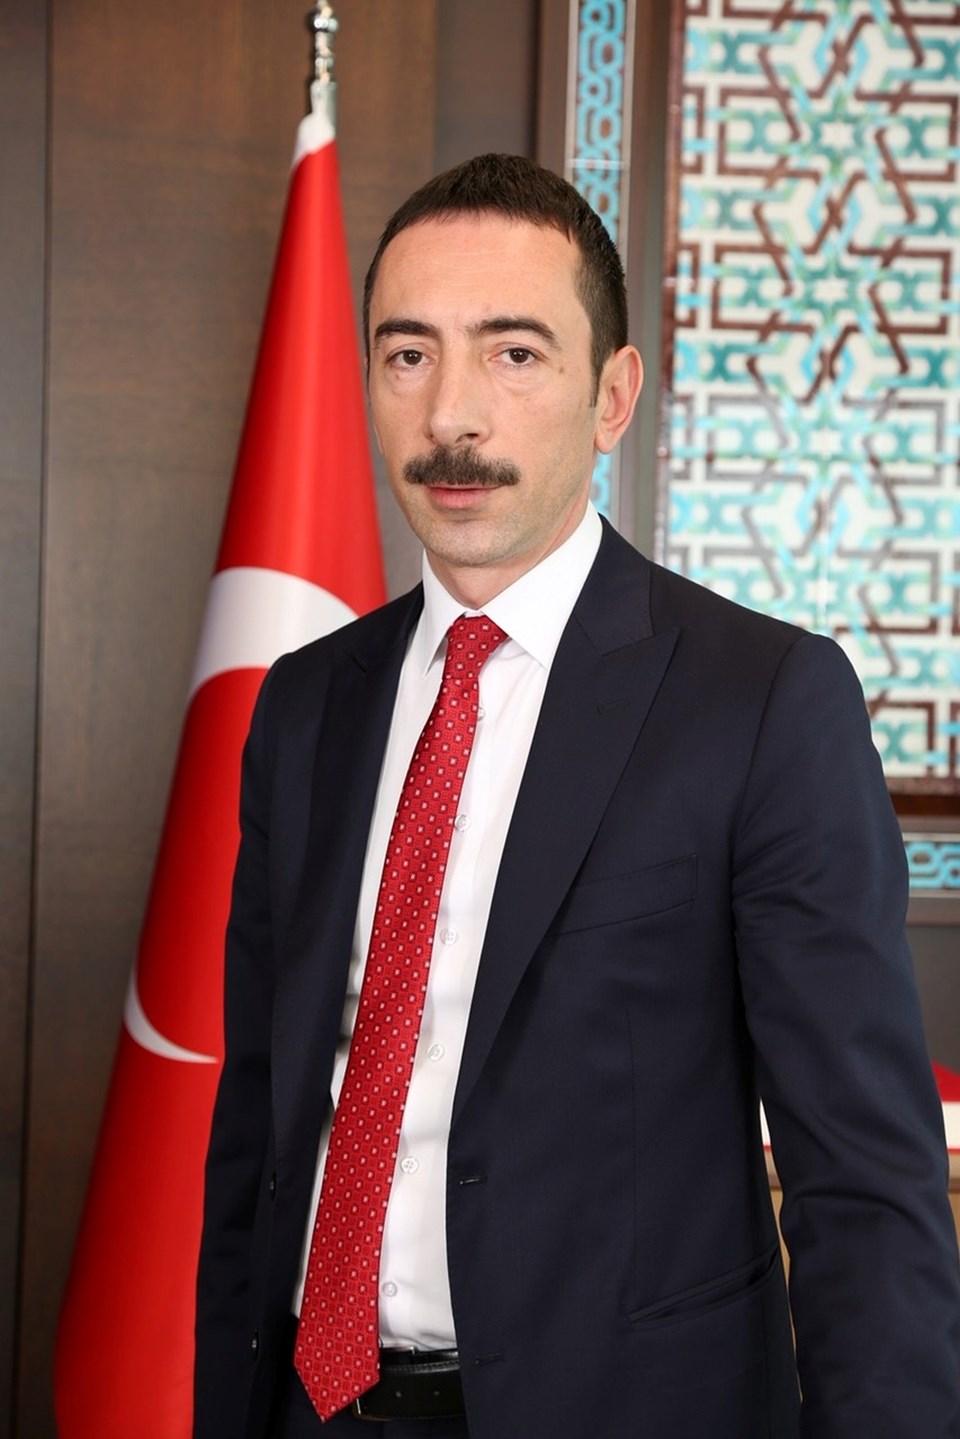 Emlak Konut GYO Genel Müdürü Hakan Gedikli